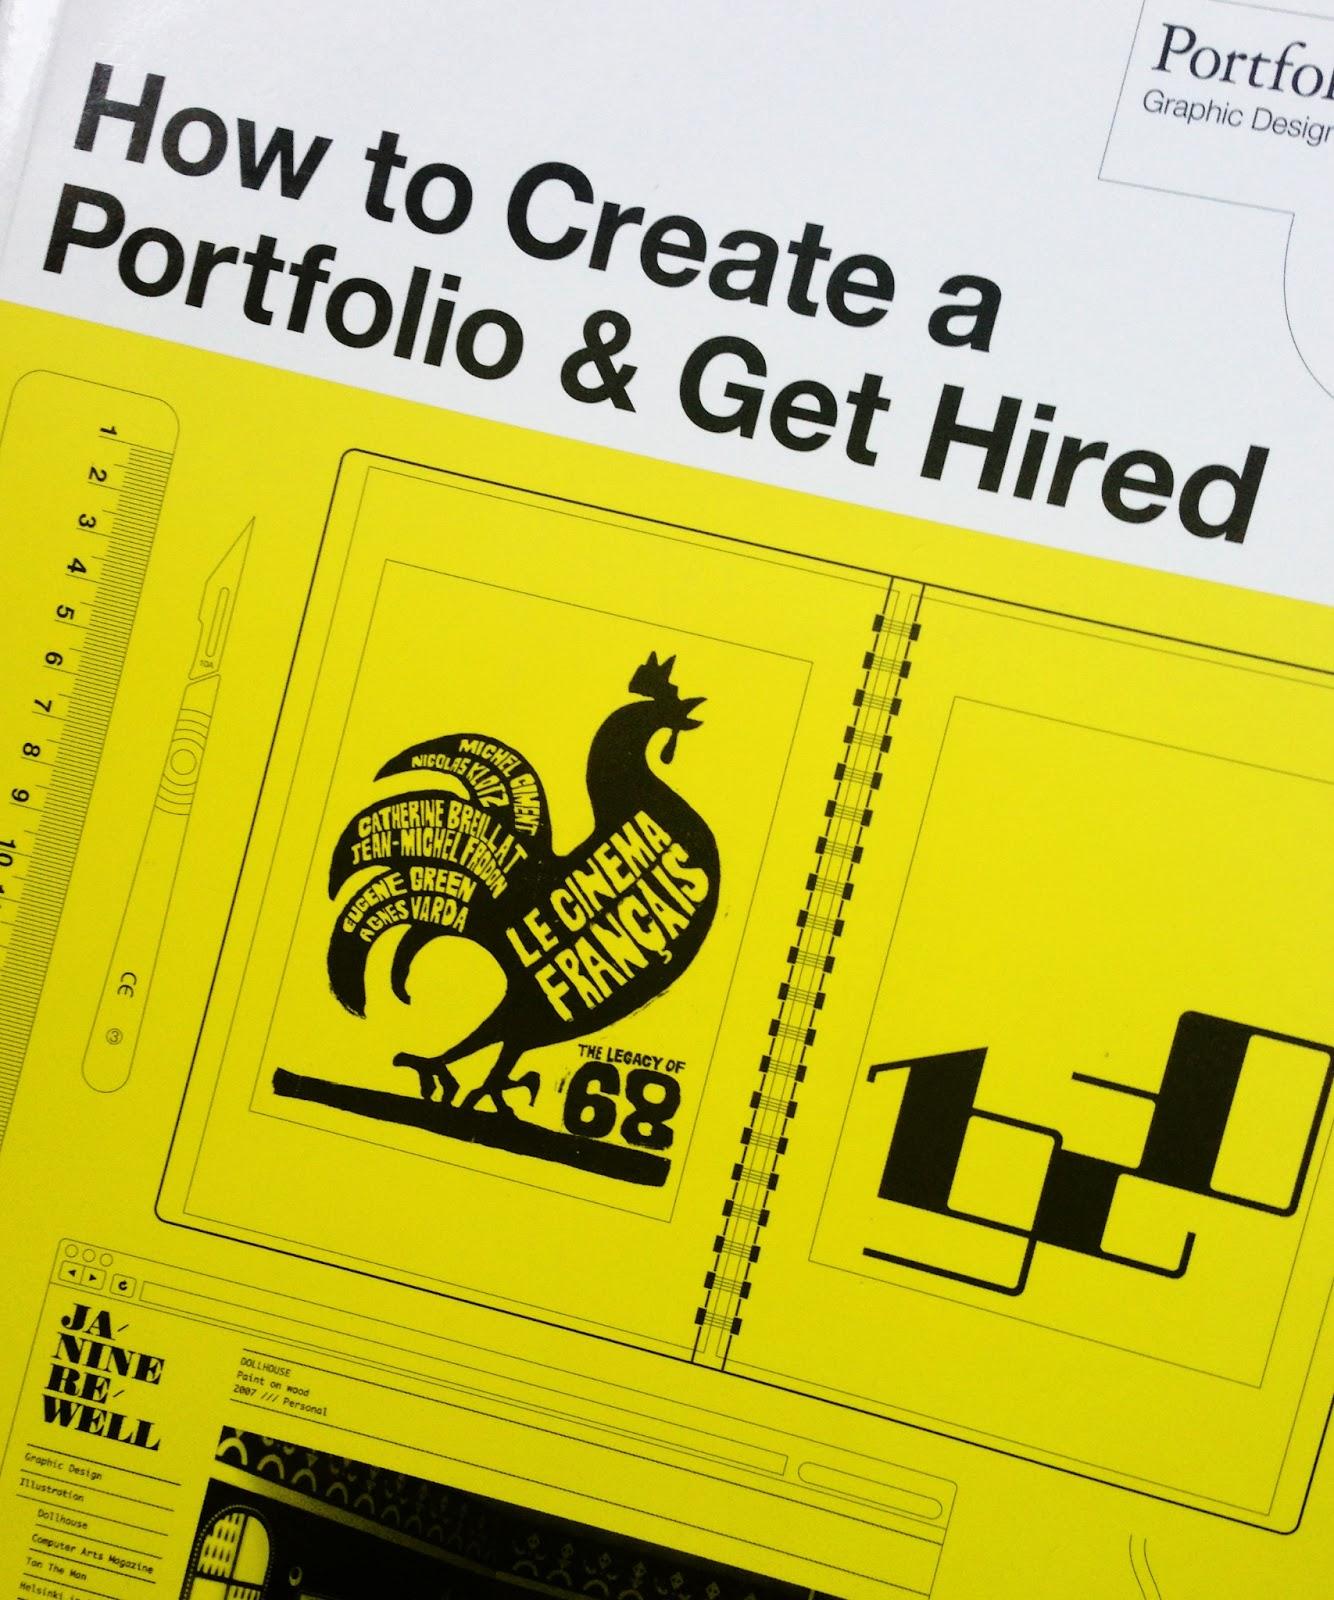 nichola watkiss how to create a portfolio